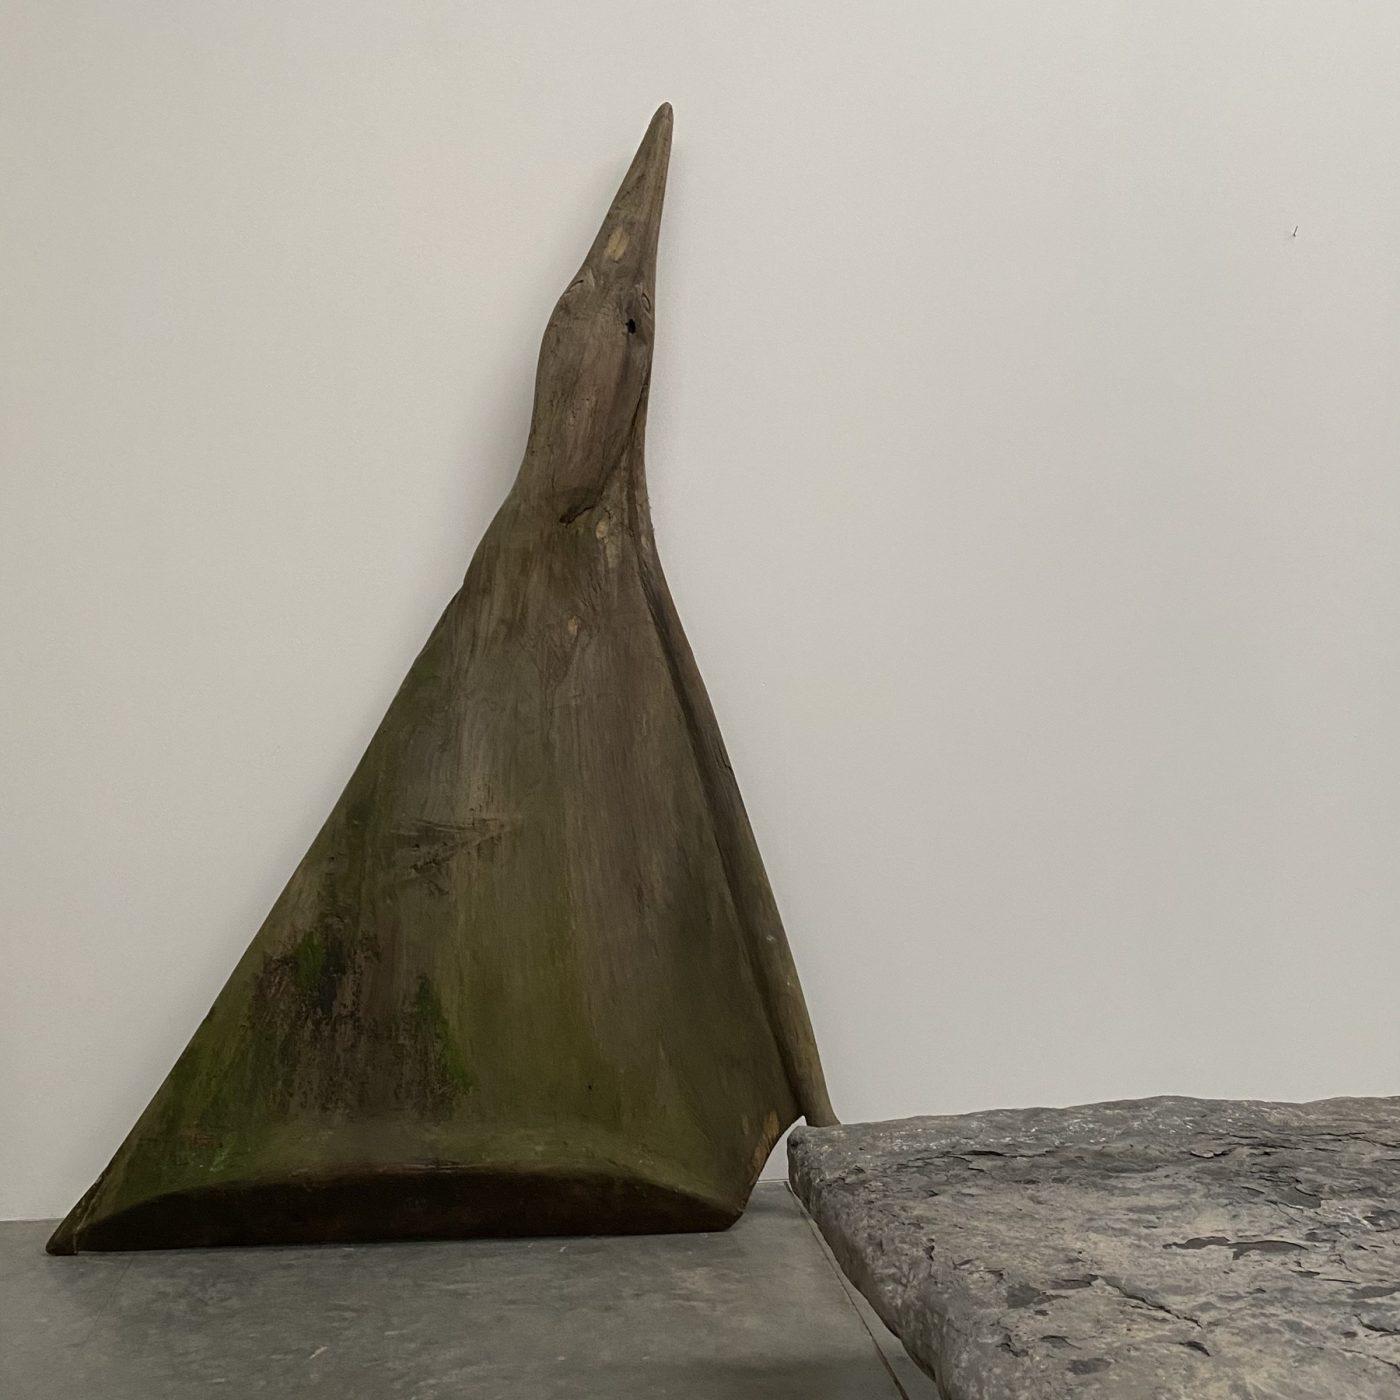 objet-vagabond-wooden-sculpture0005